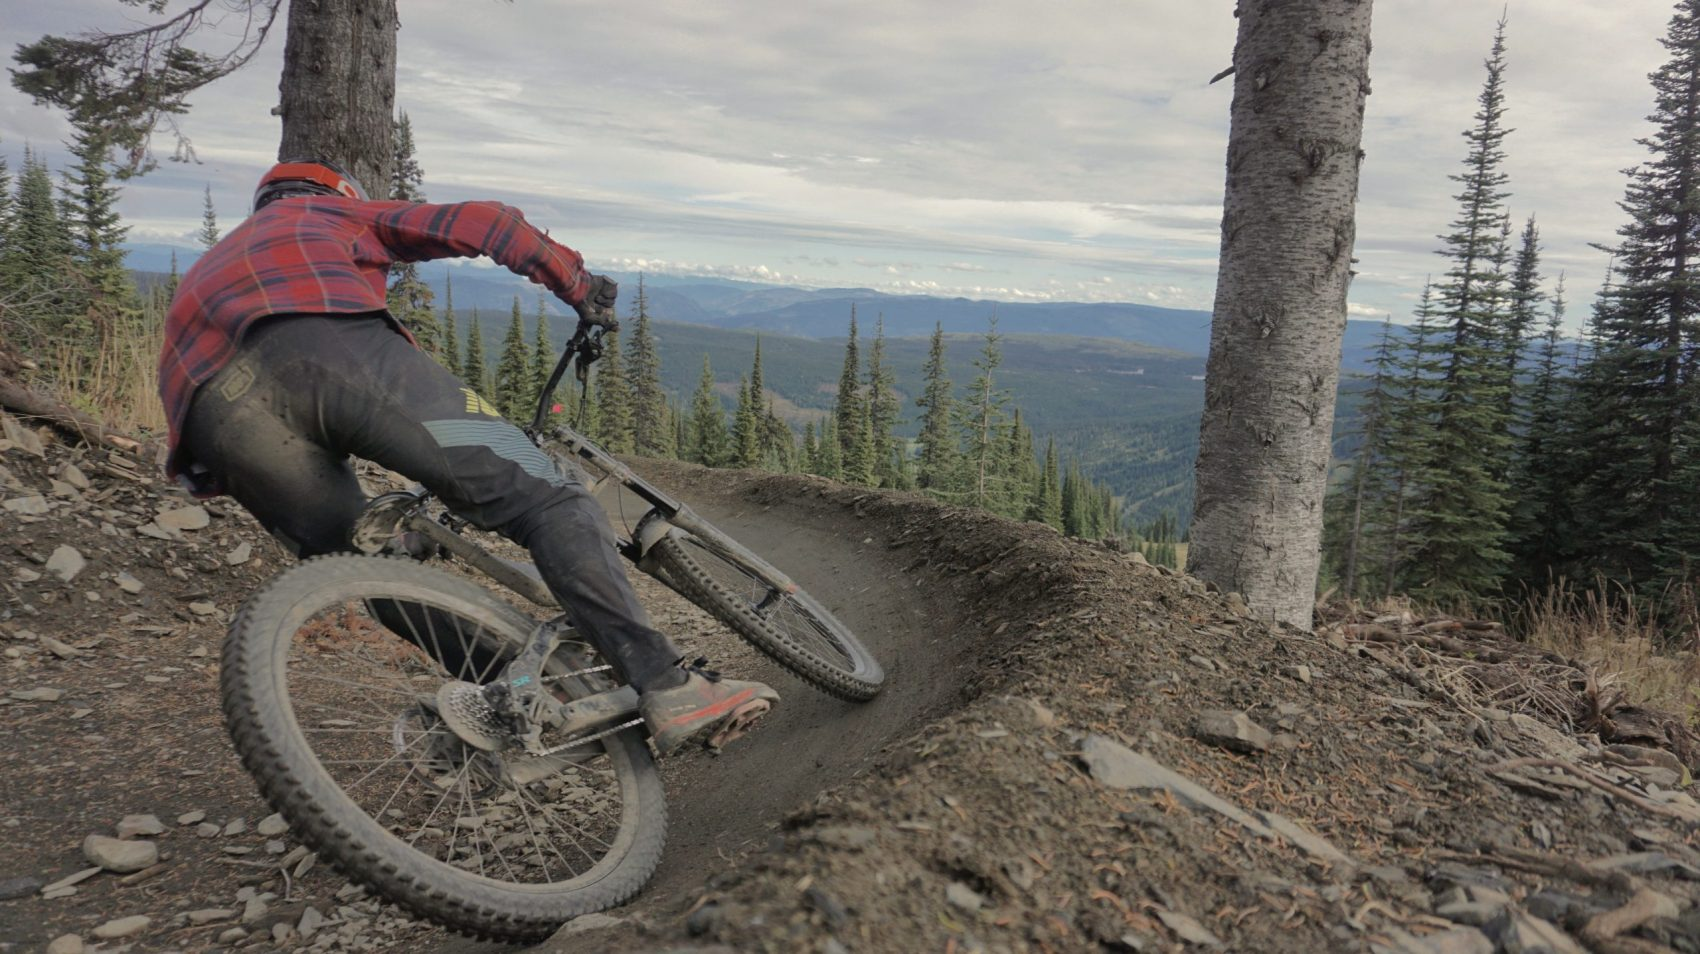 Sun Peaks Bike Park Mountain Biking Berm